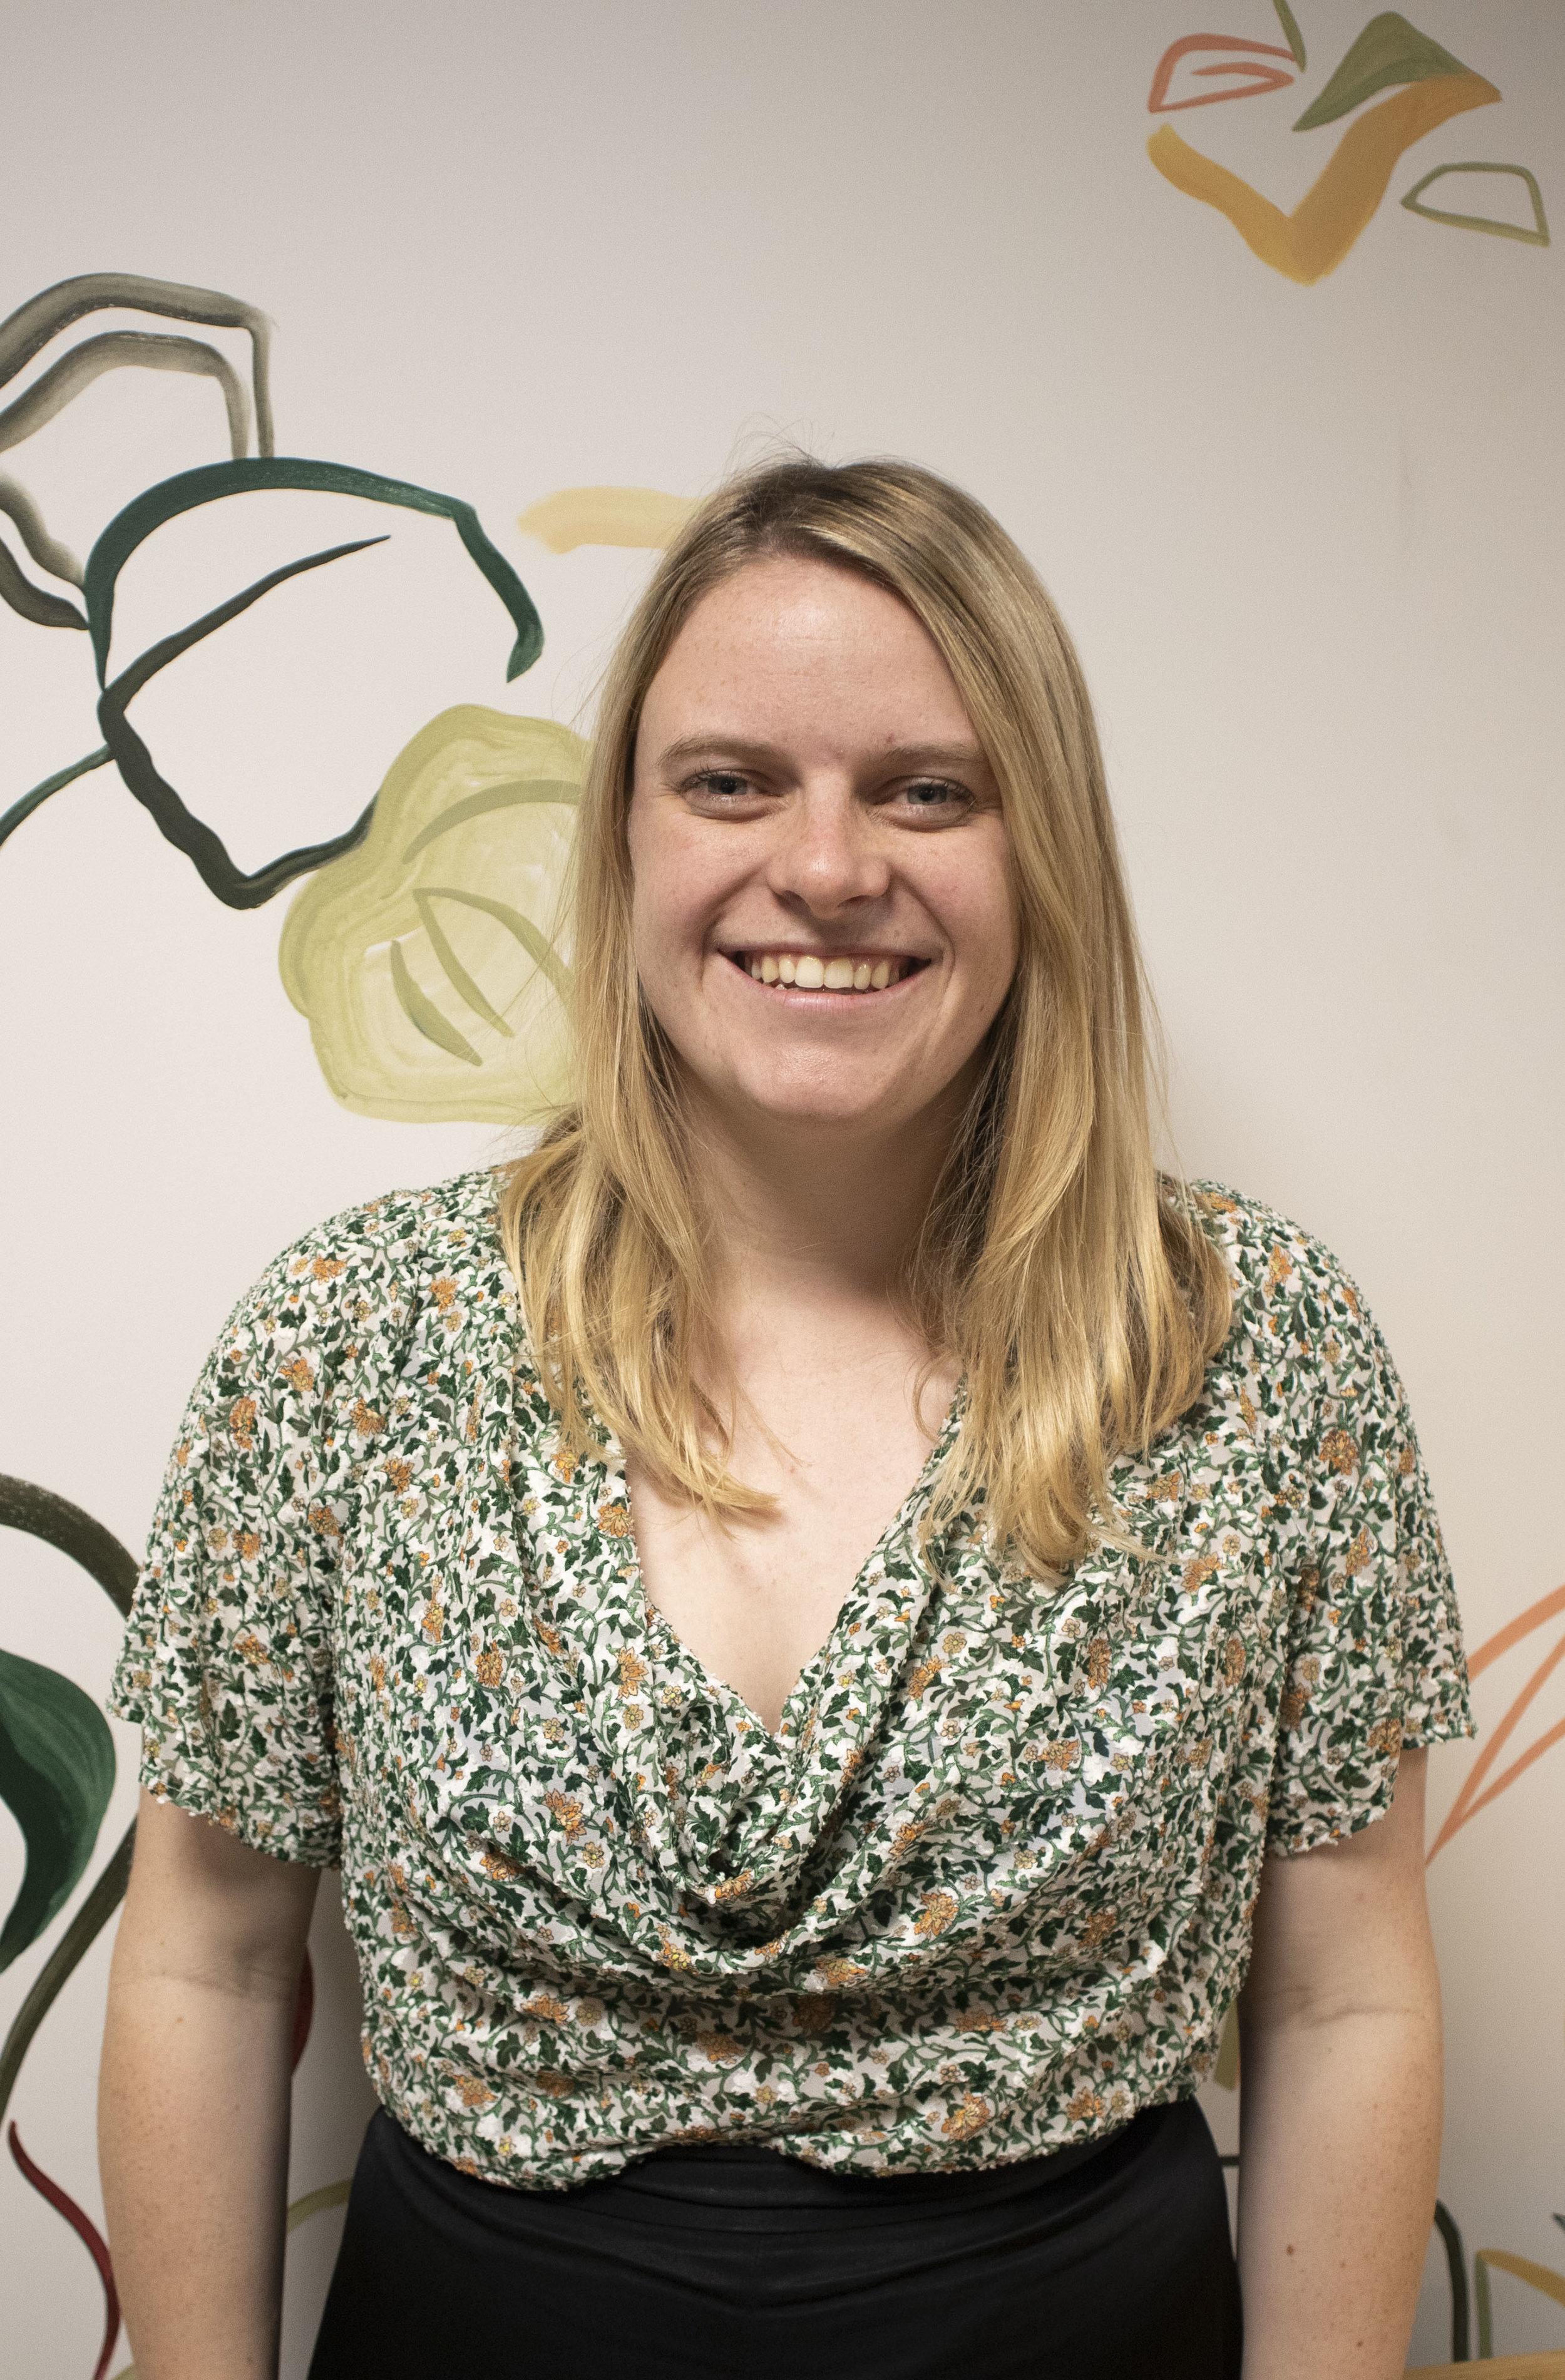 MirandaHitchings - Co-founder and Strategic Advisor